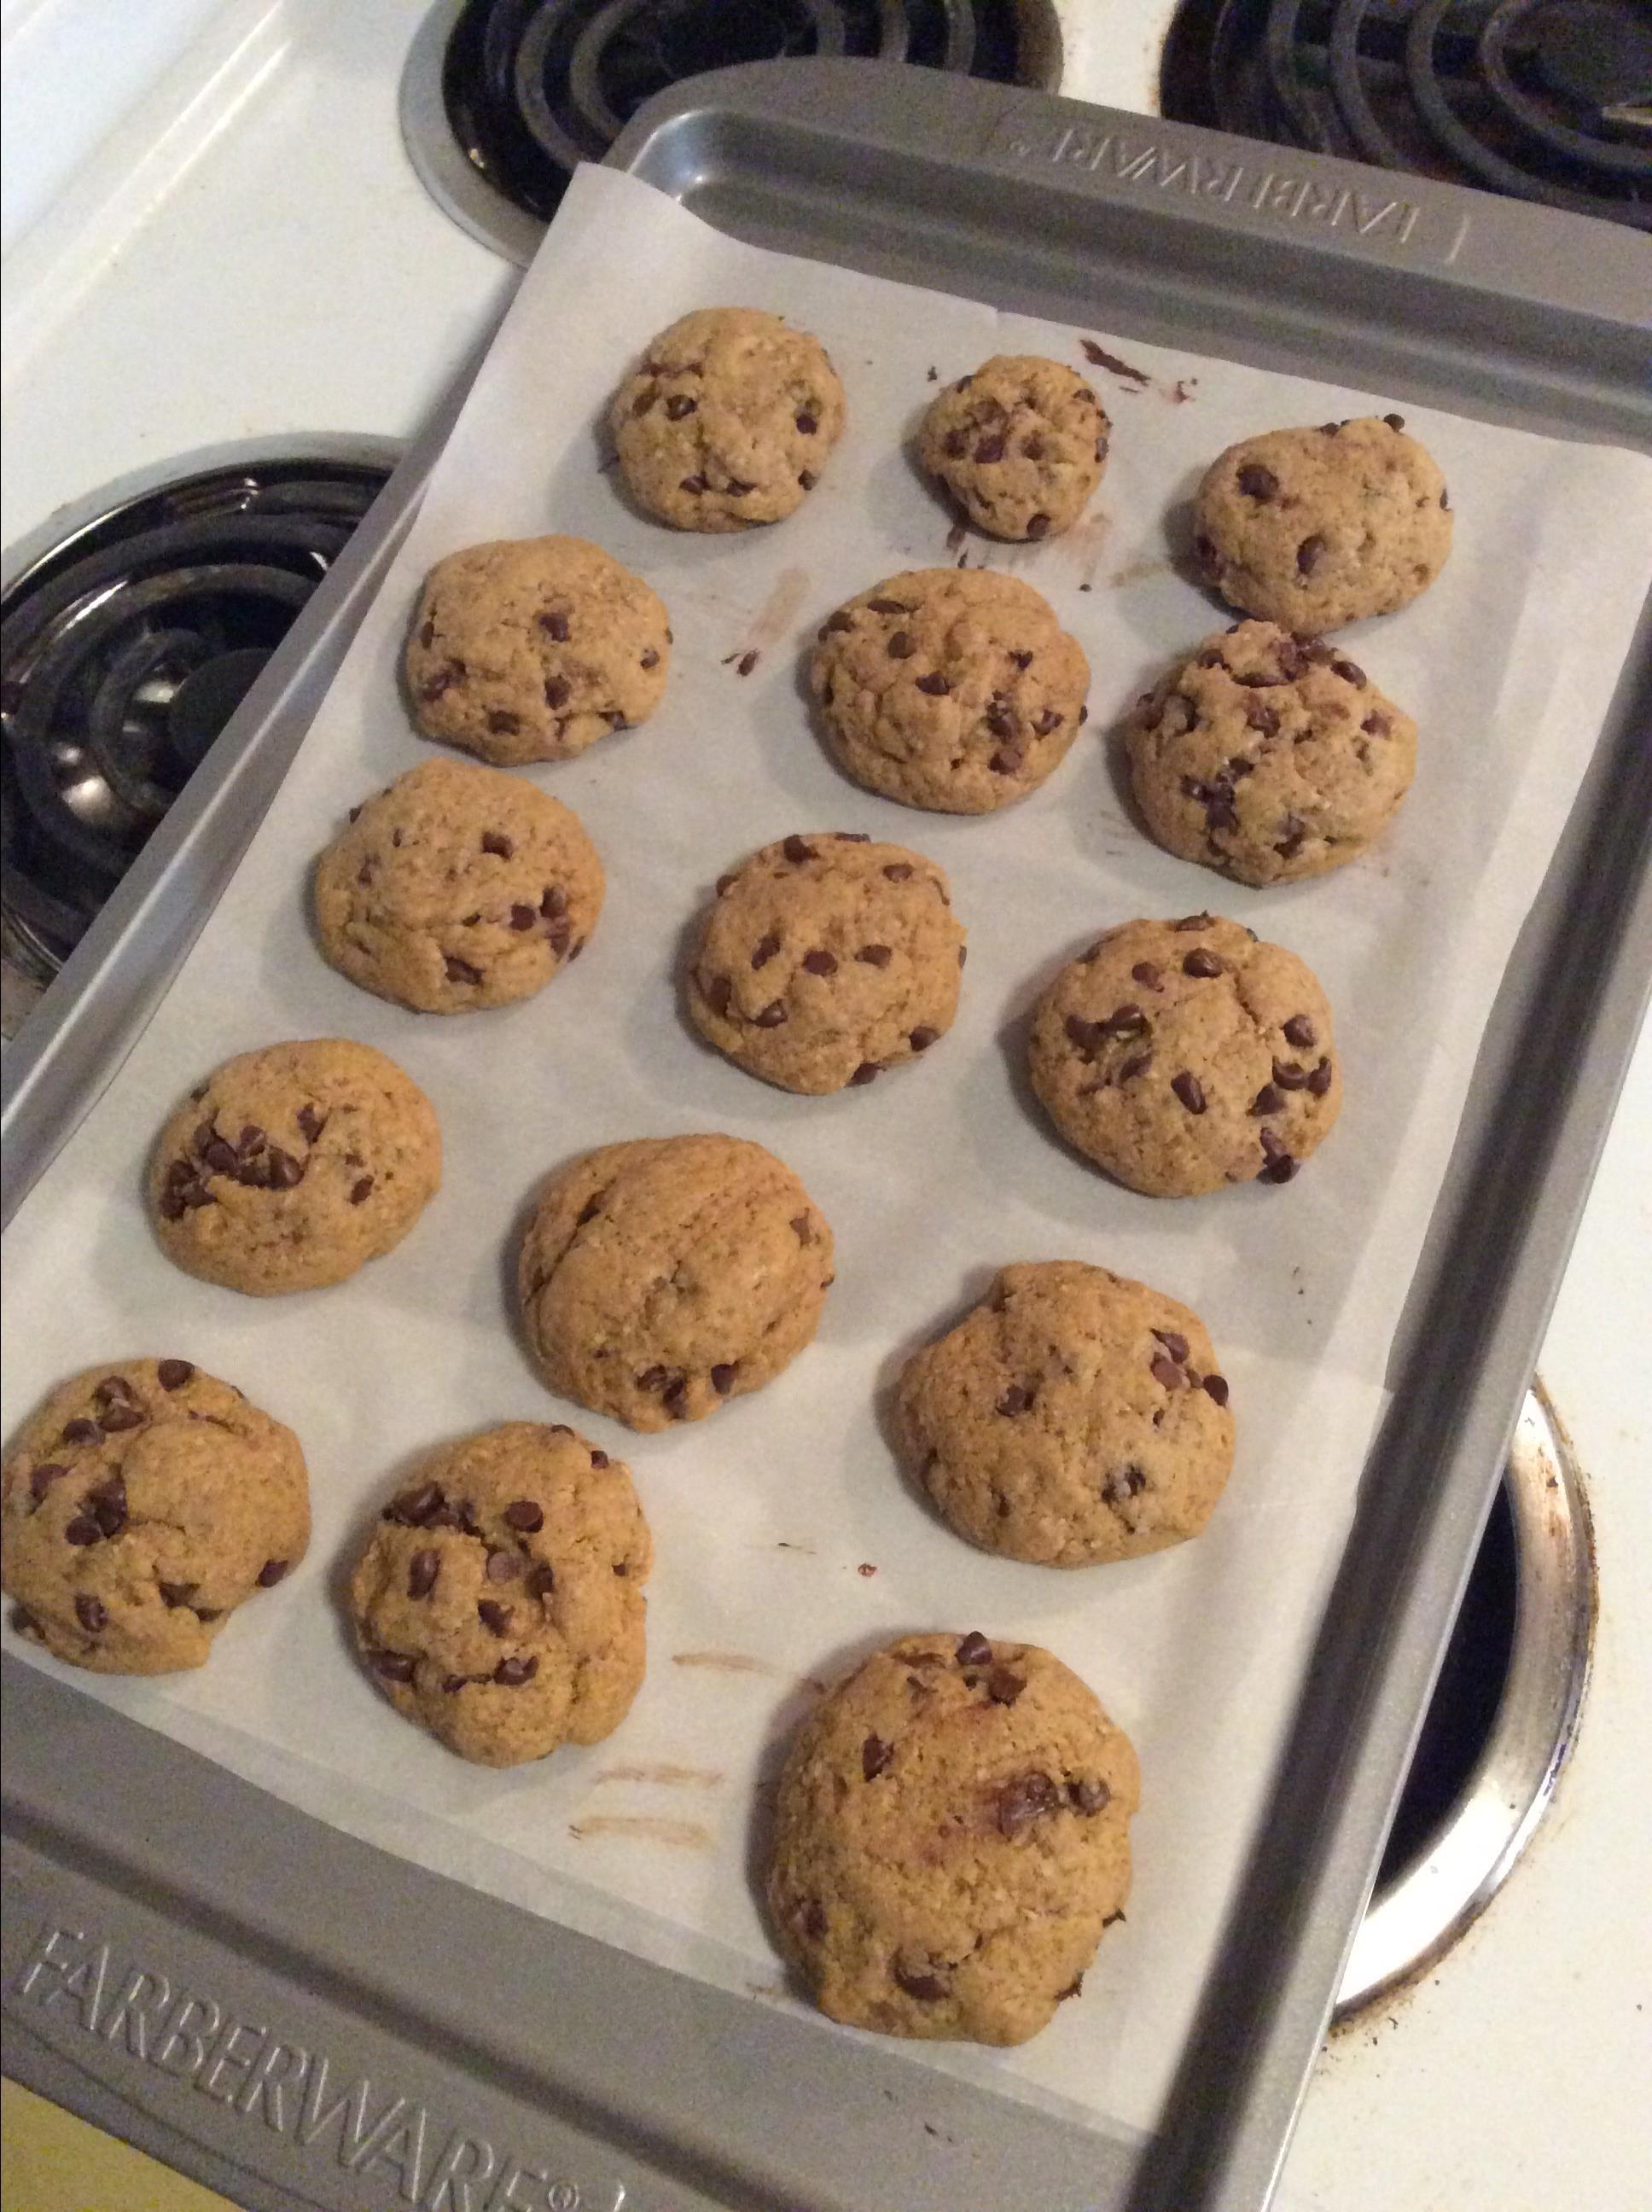 Coconut Oil Milk Chocolate Chip Oat Cookies Lisa